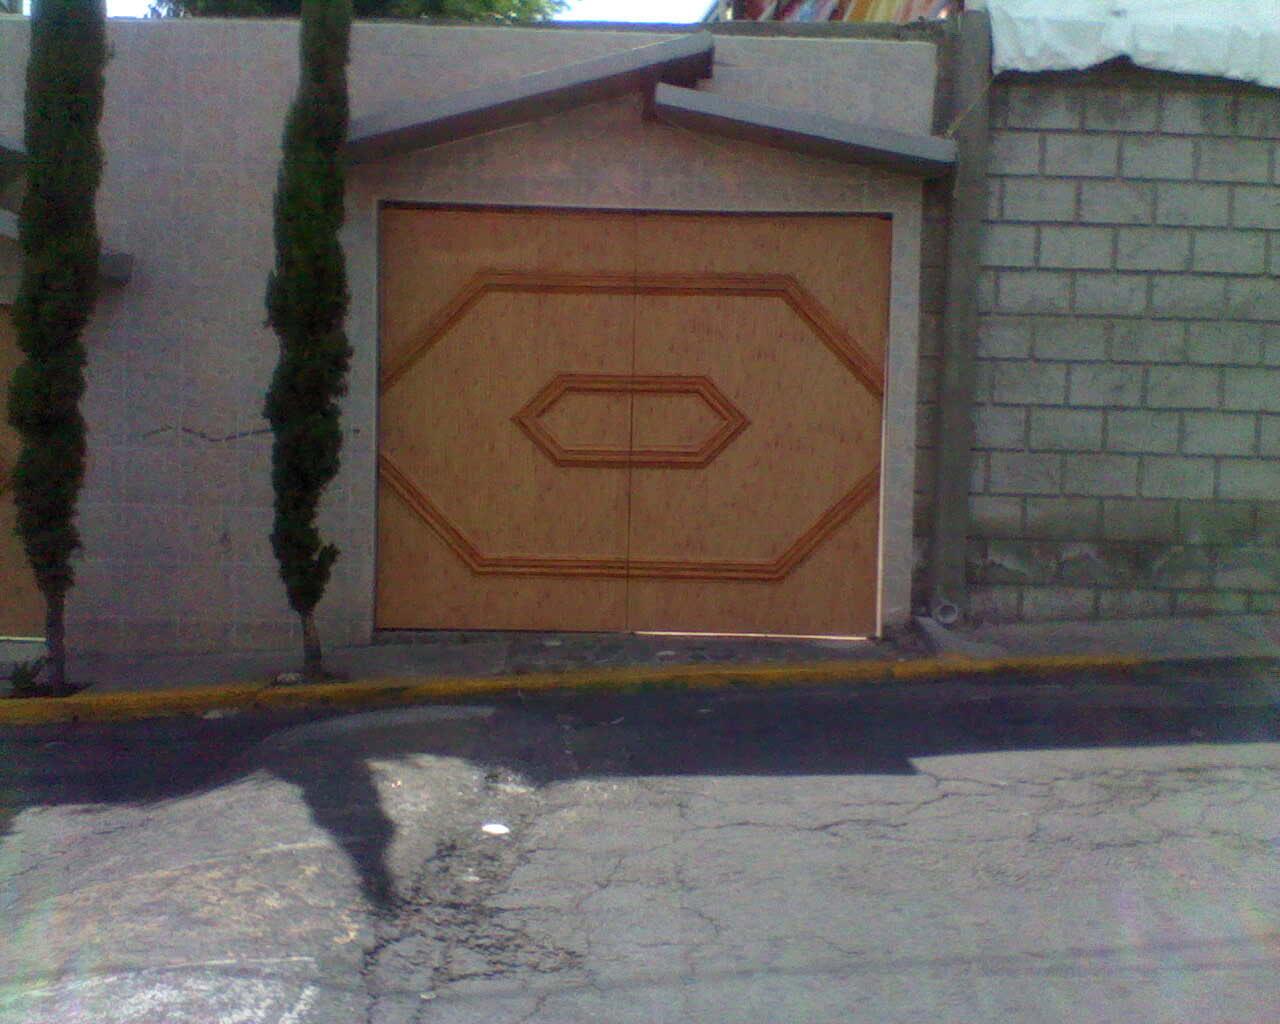 La puerta autom tica iztapalapa Puertas automaticas df